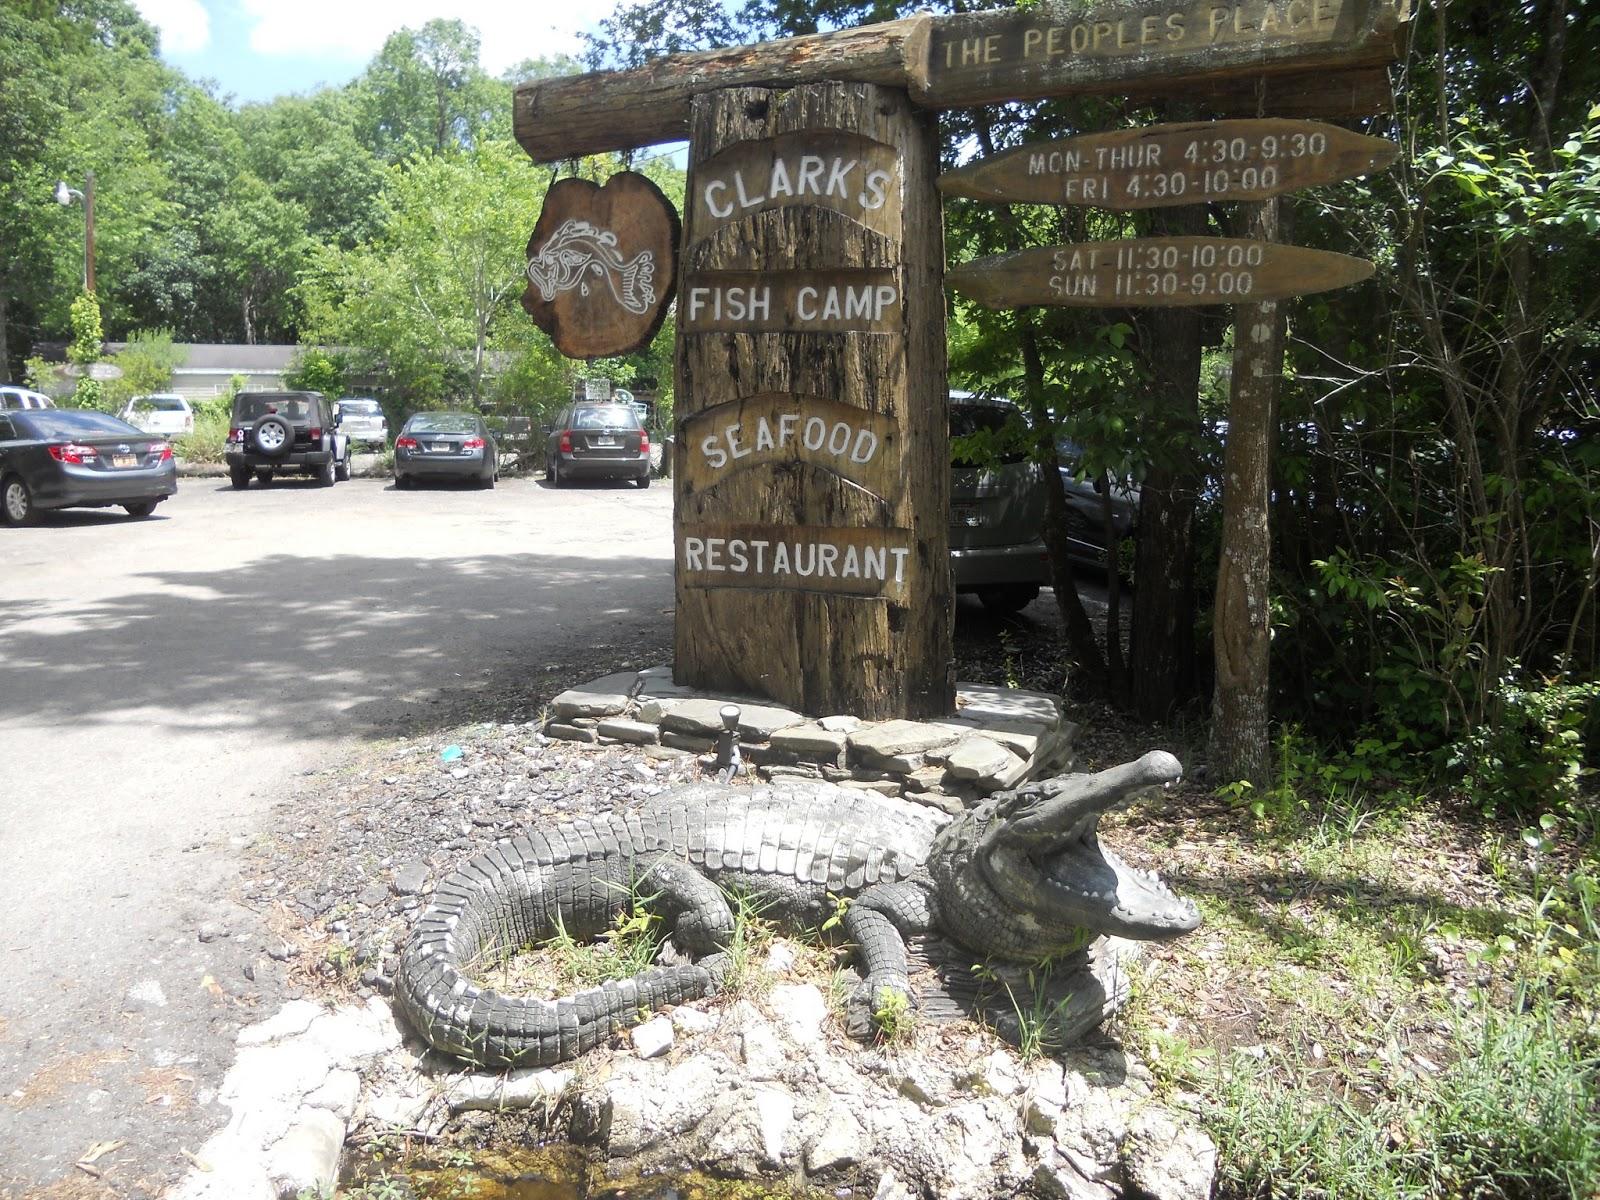 Clark 39 s fish camp jacksonville fl mcentegart 39 s rv escapades for Fish camp jacksonville